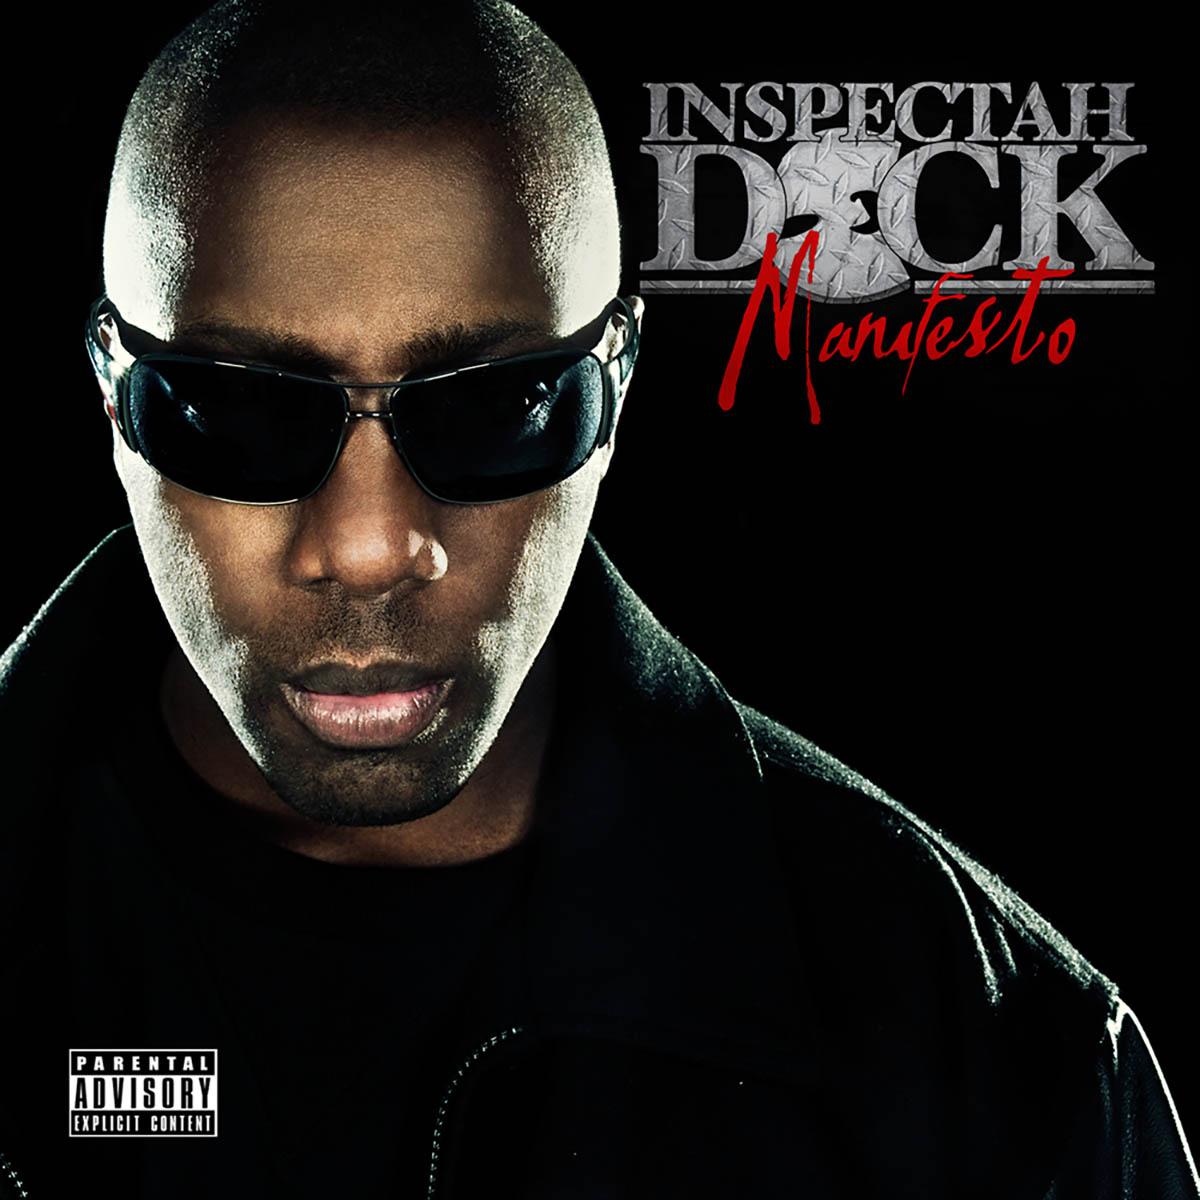 Inspectah Deck, Manifesto